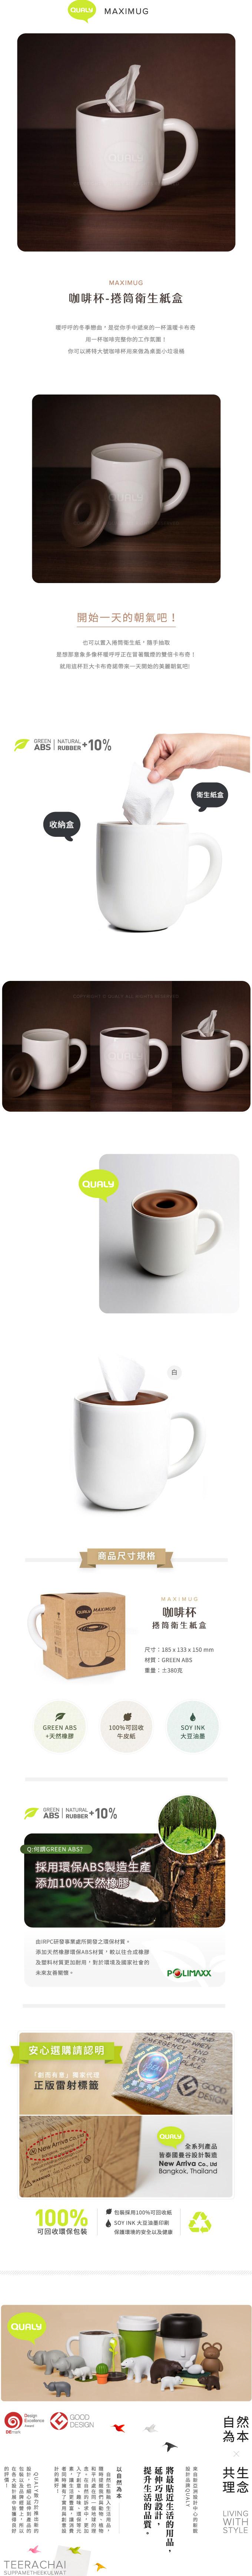 QUALY 咖啡杯 捲筒衛生紙盒